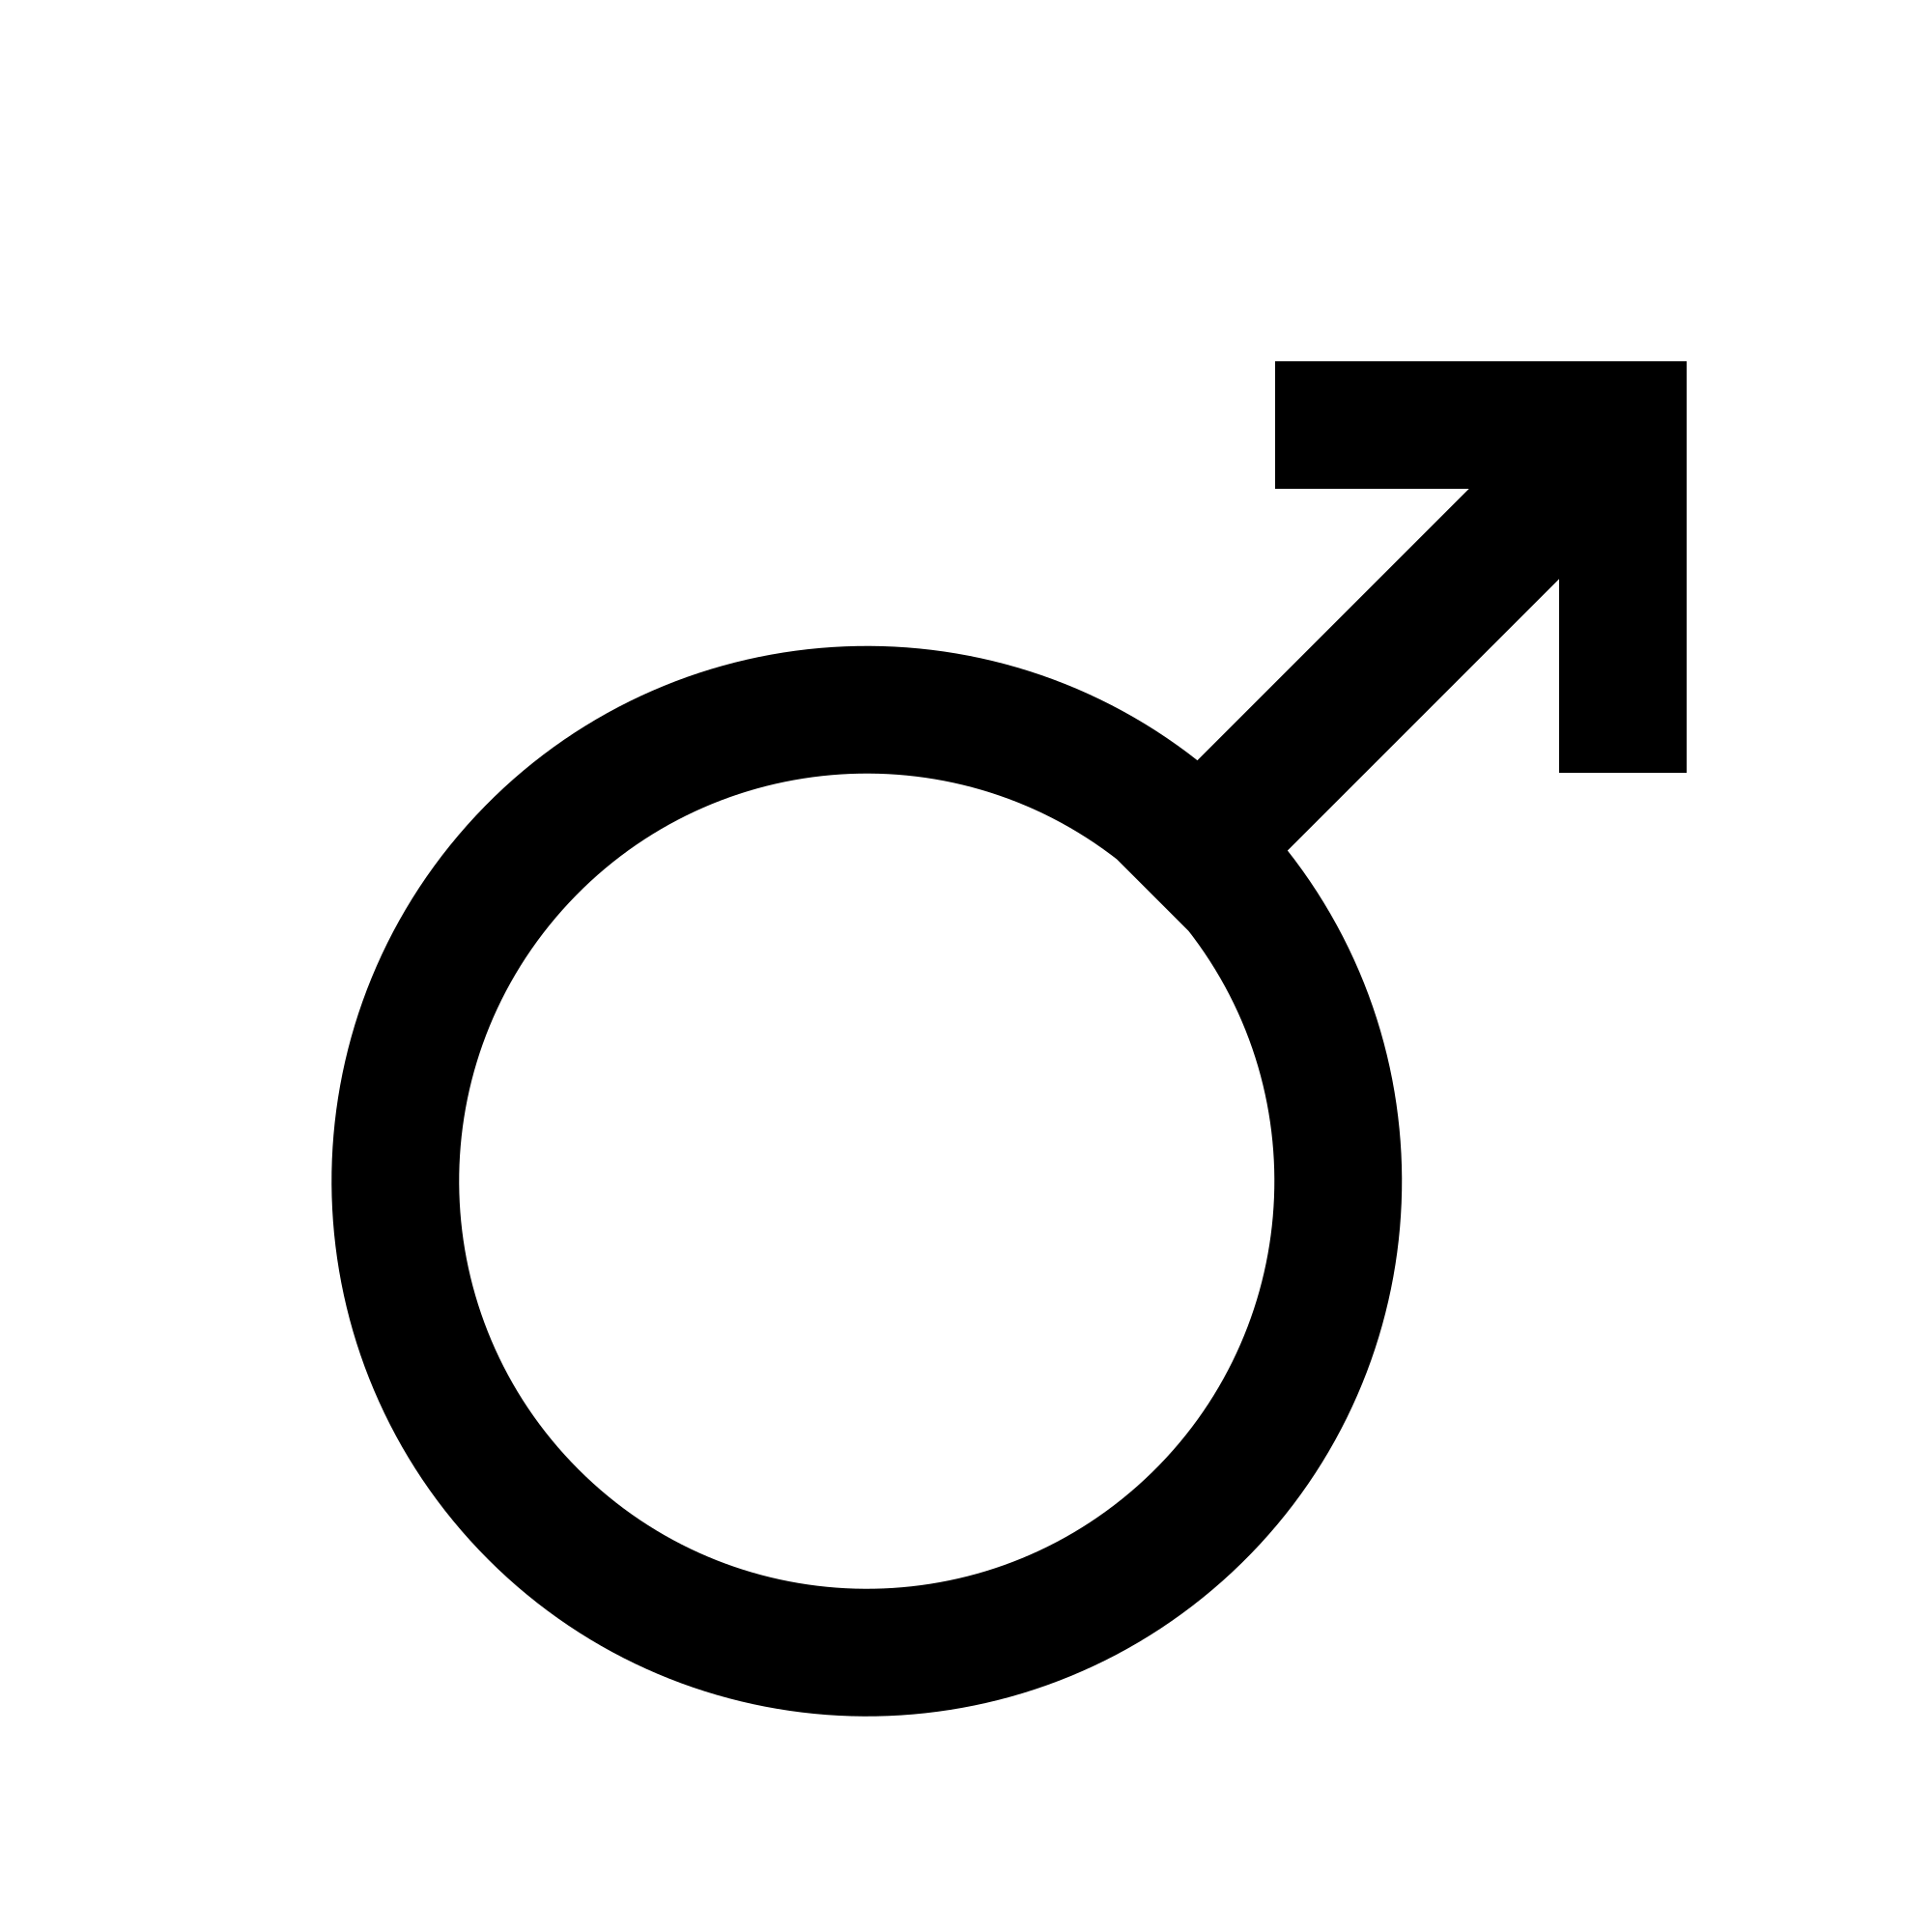 Sex Position Symbole für SMS